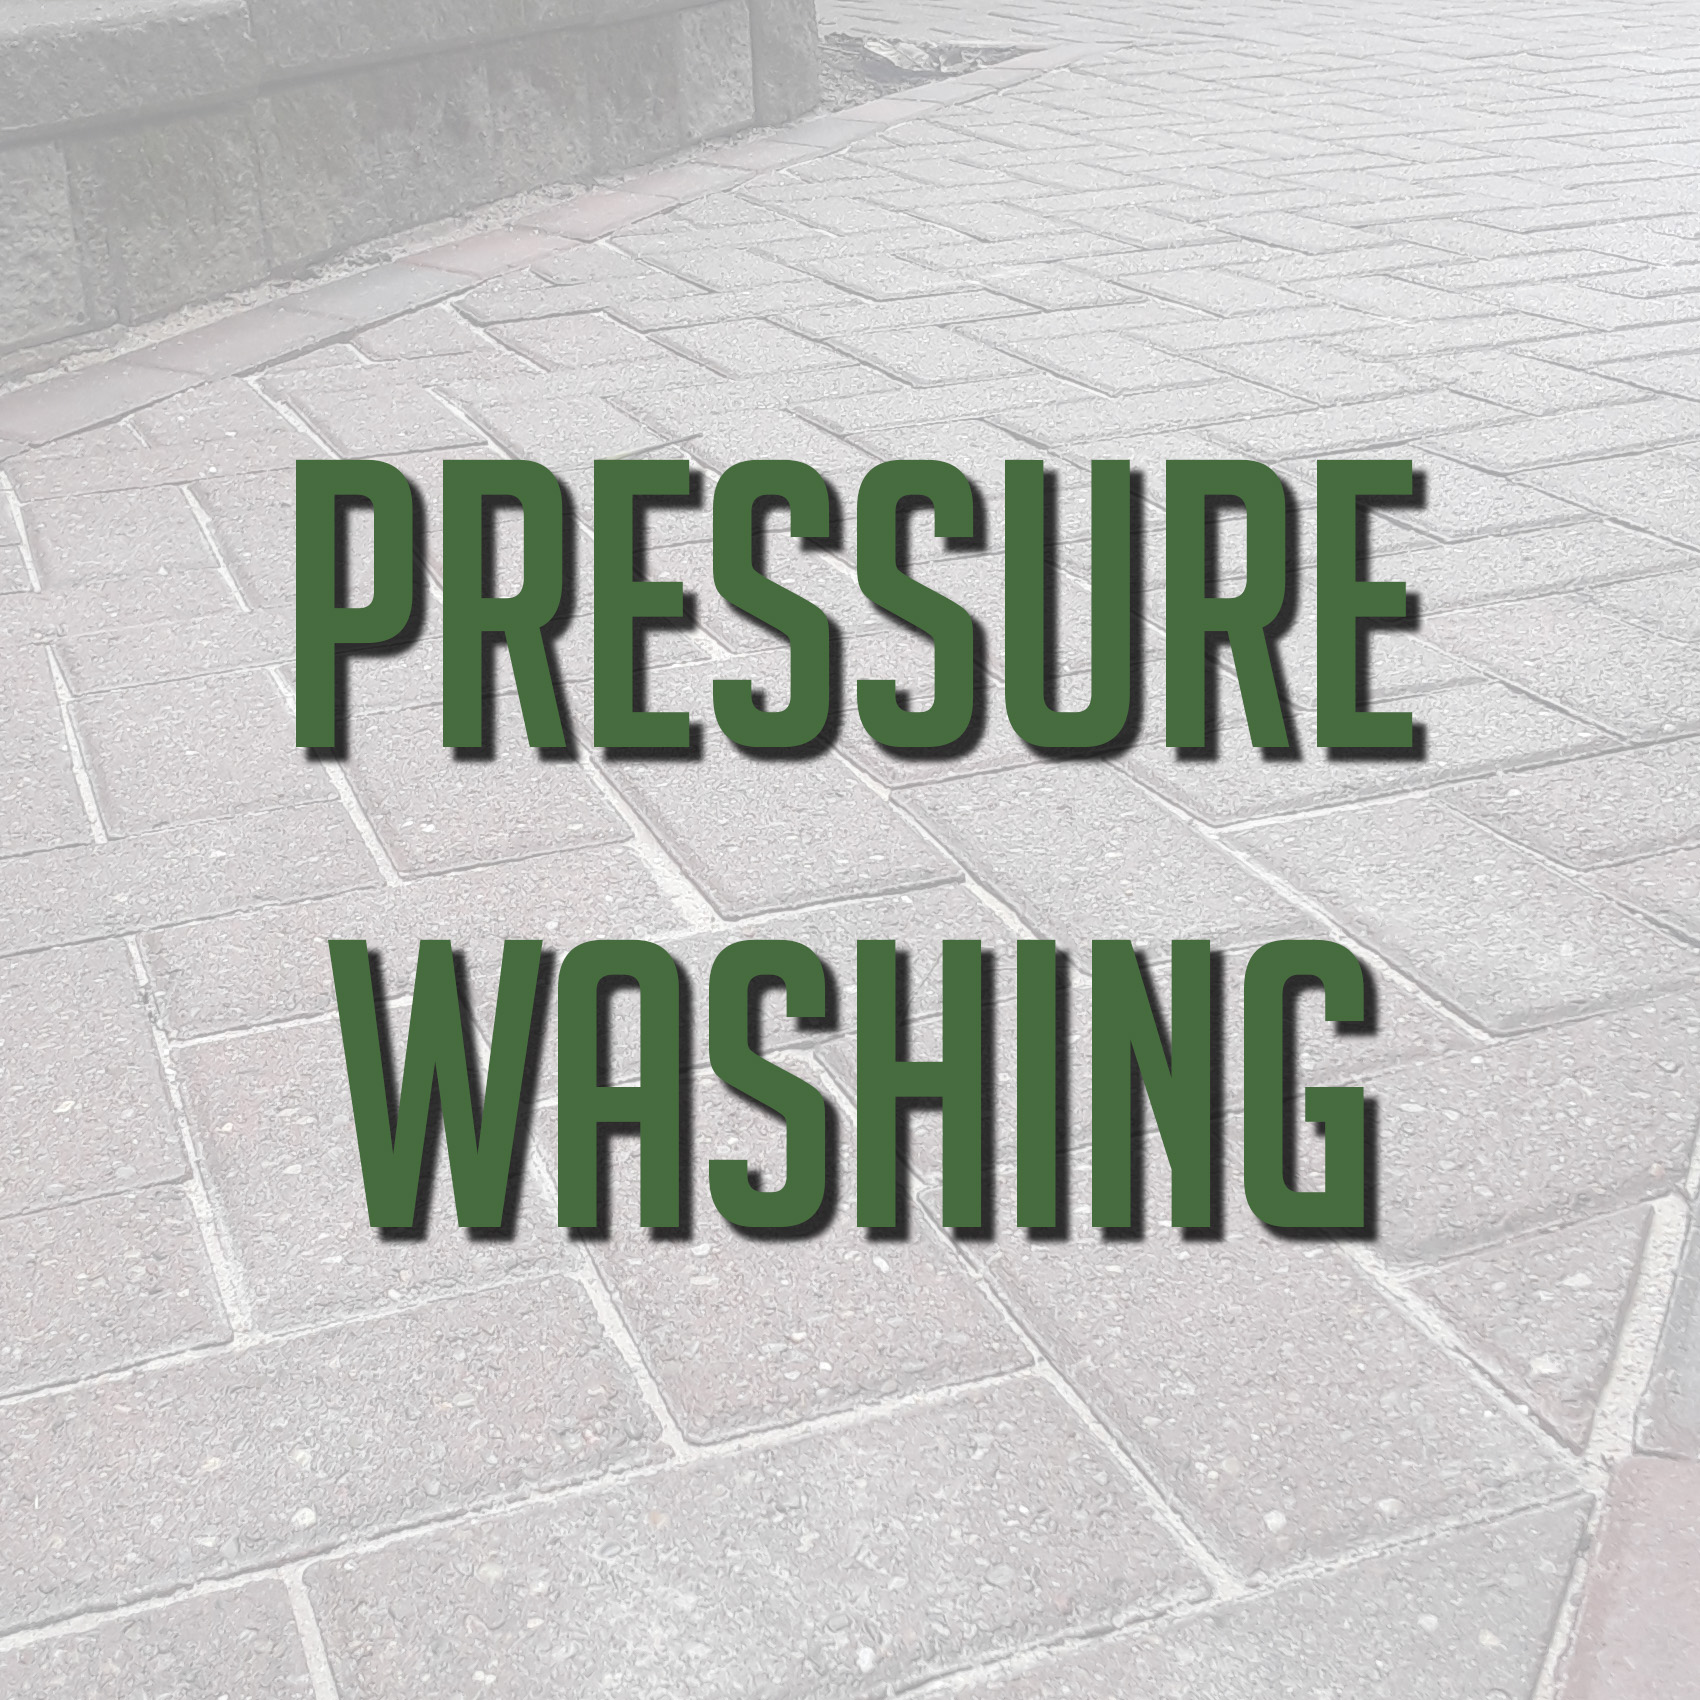 pressure washing.jpg